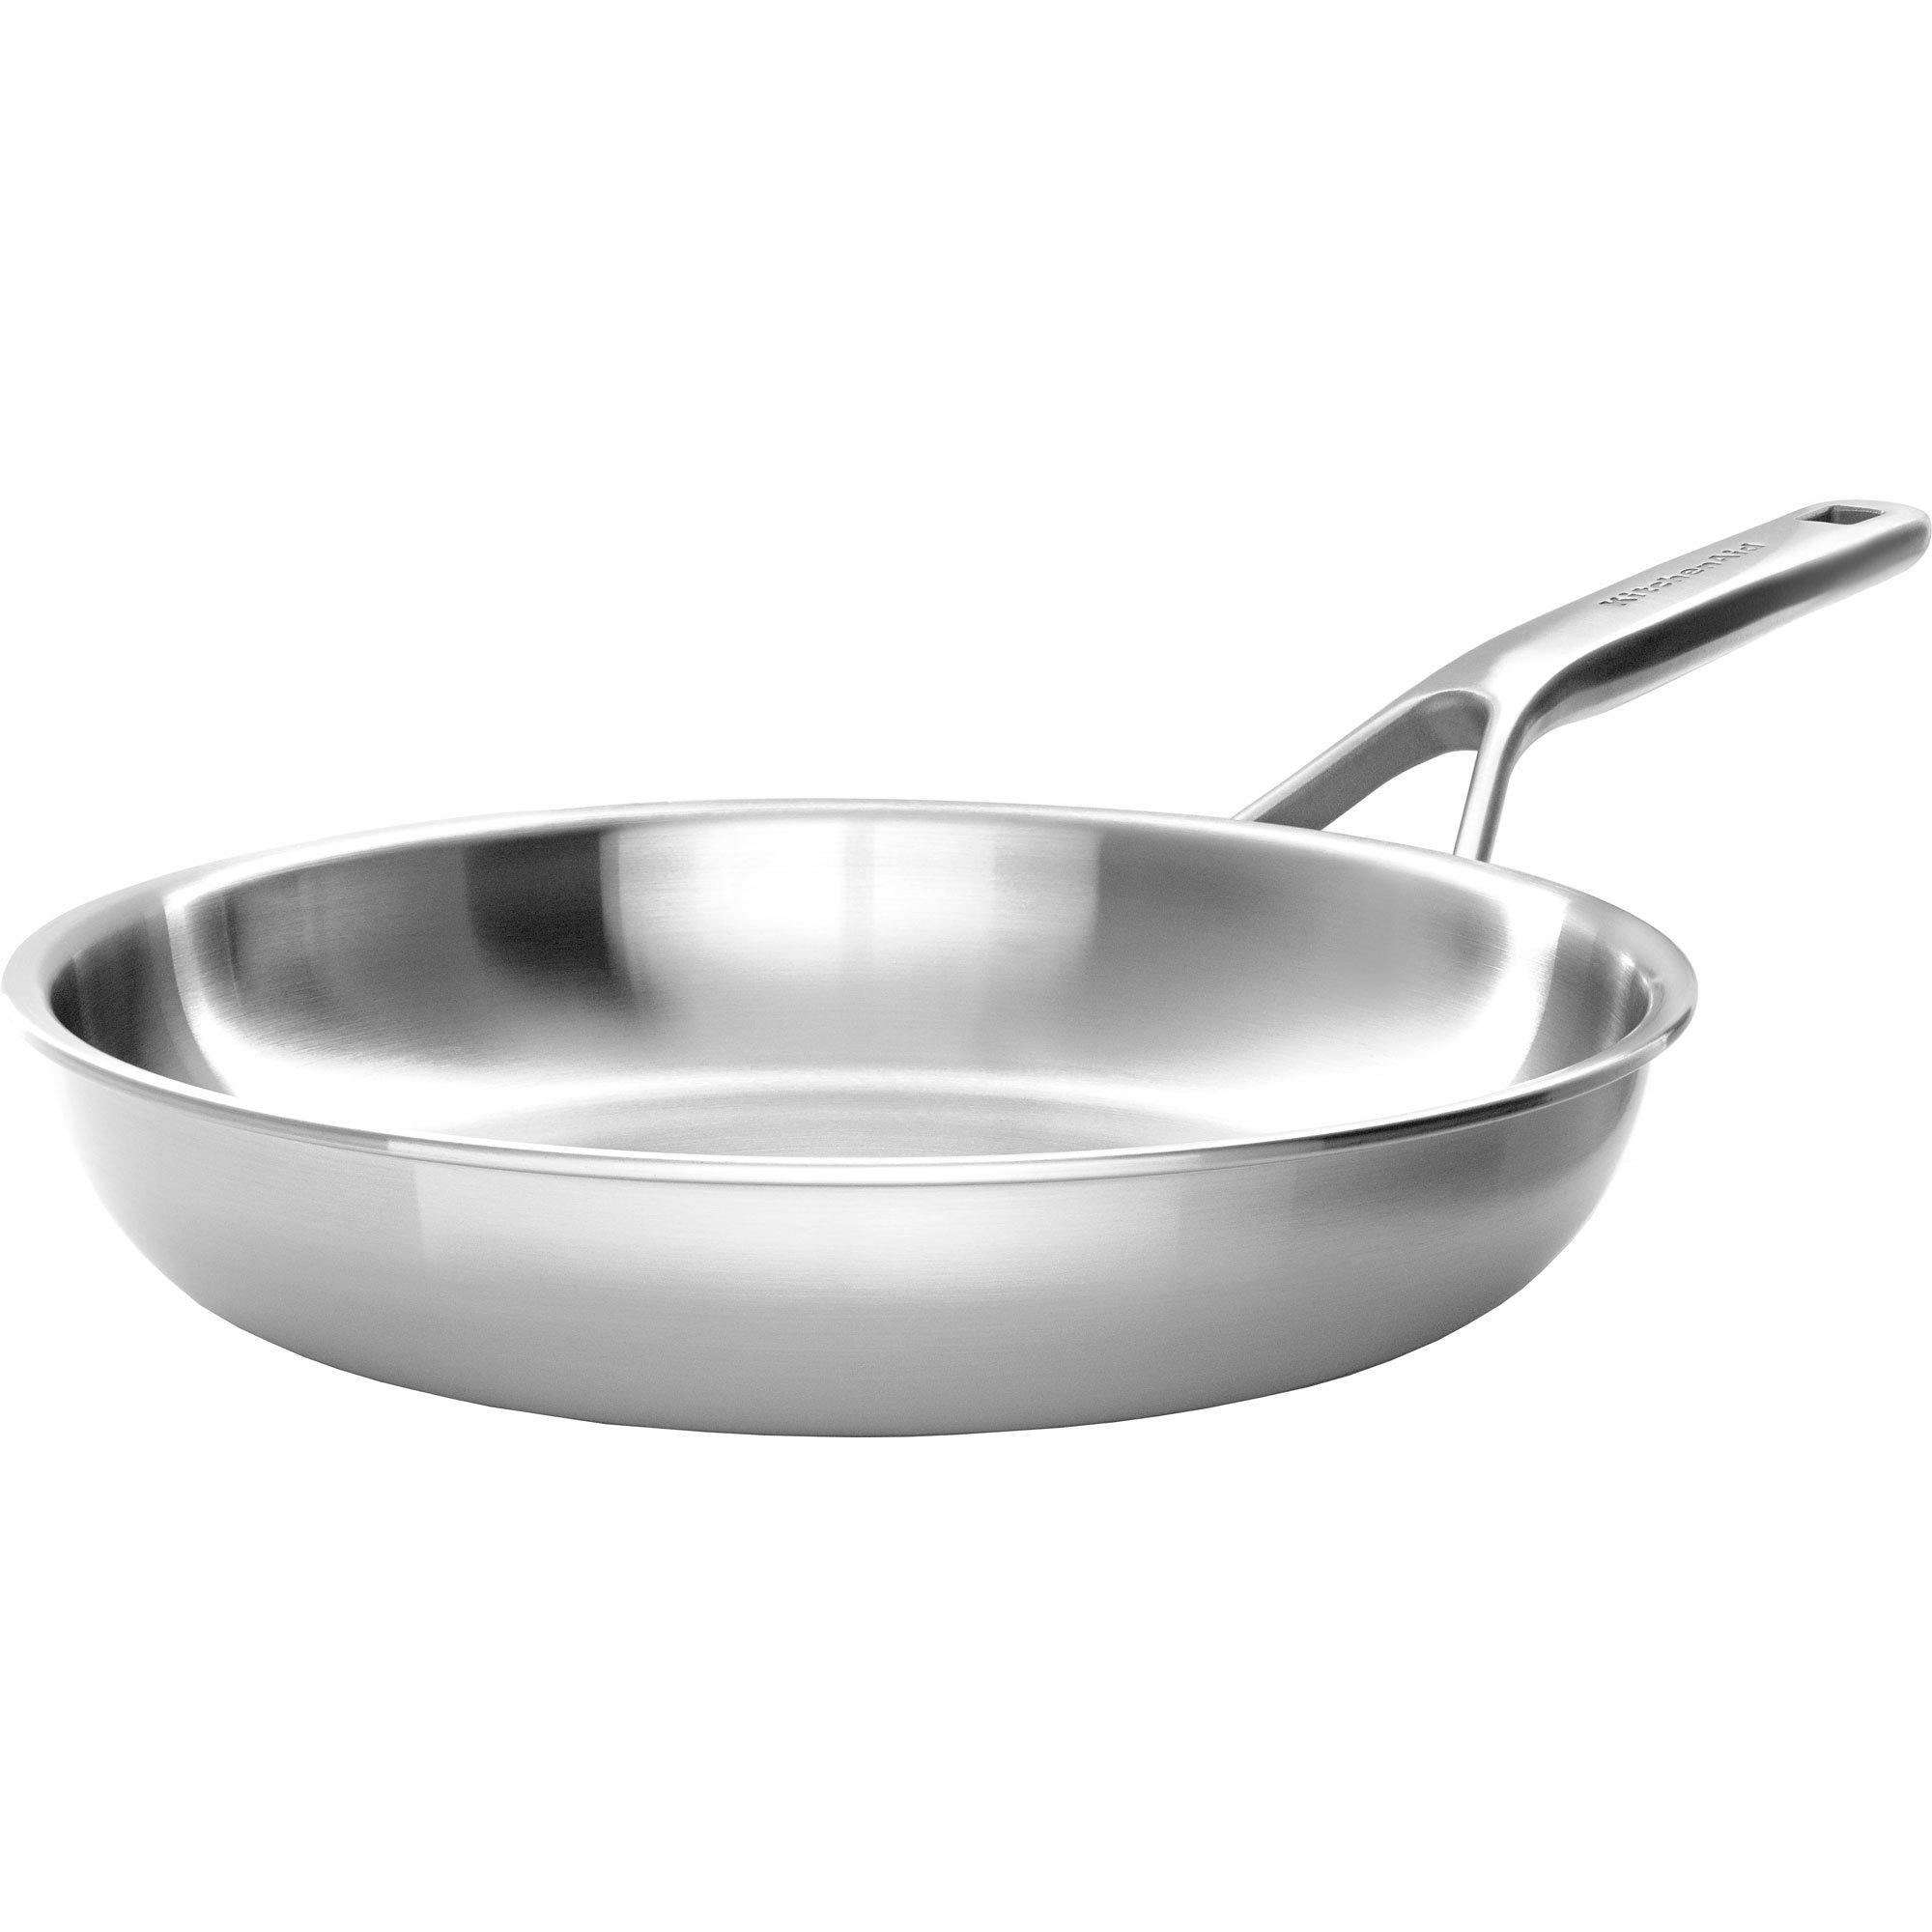 KitchenAid Cookware Collection Stekpanna silver 24 cm